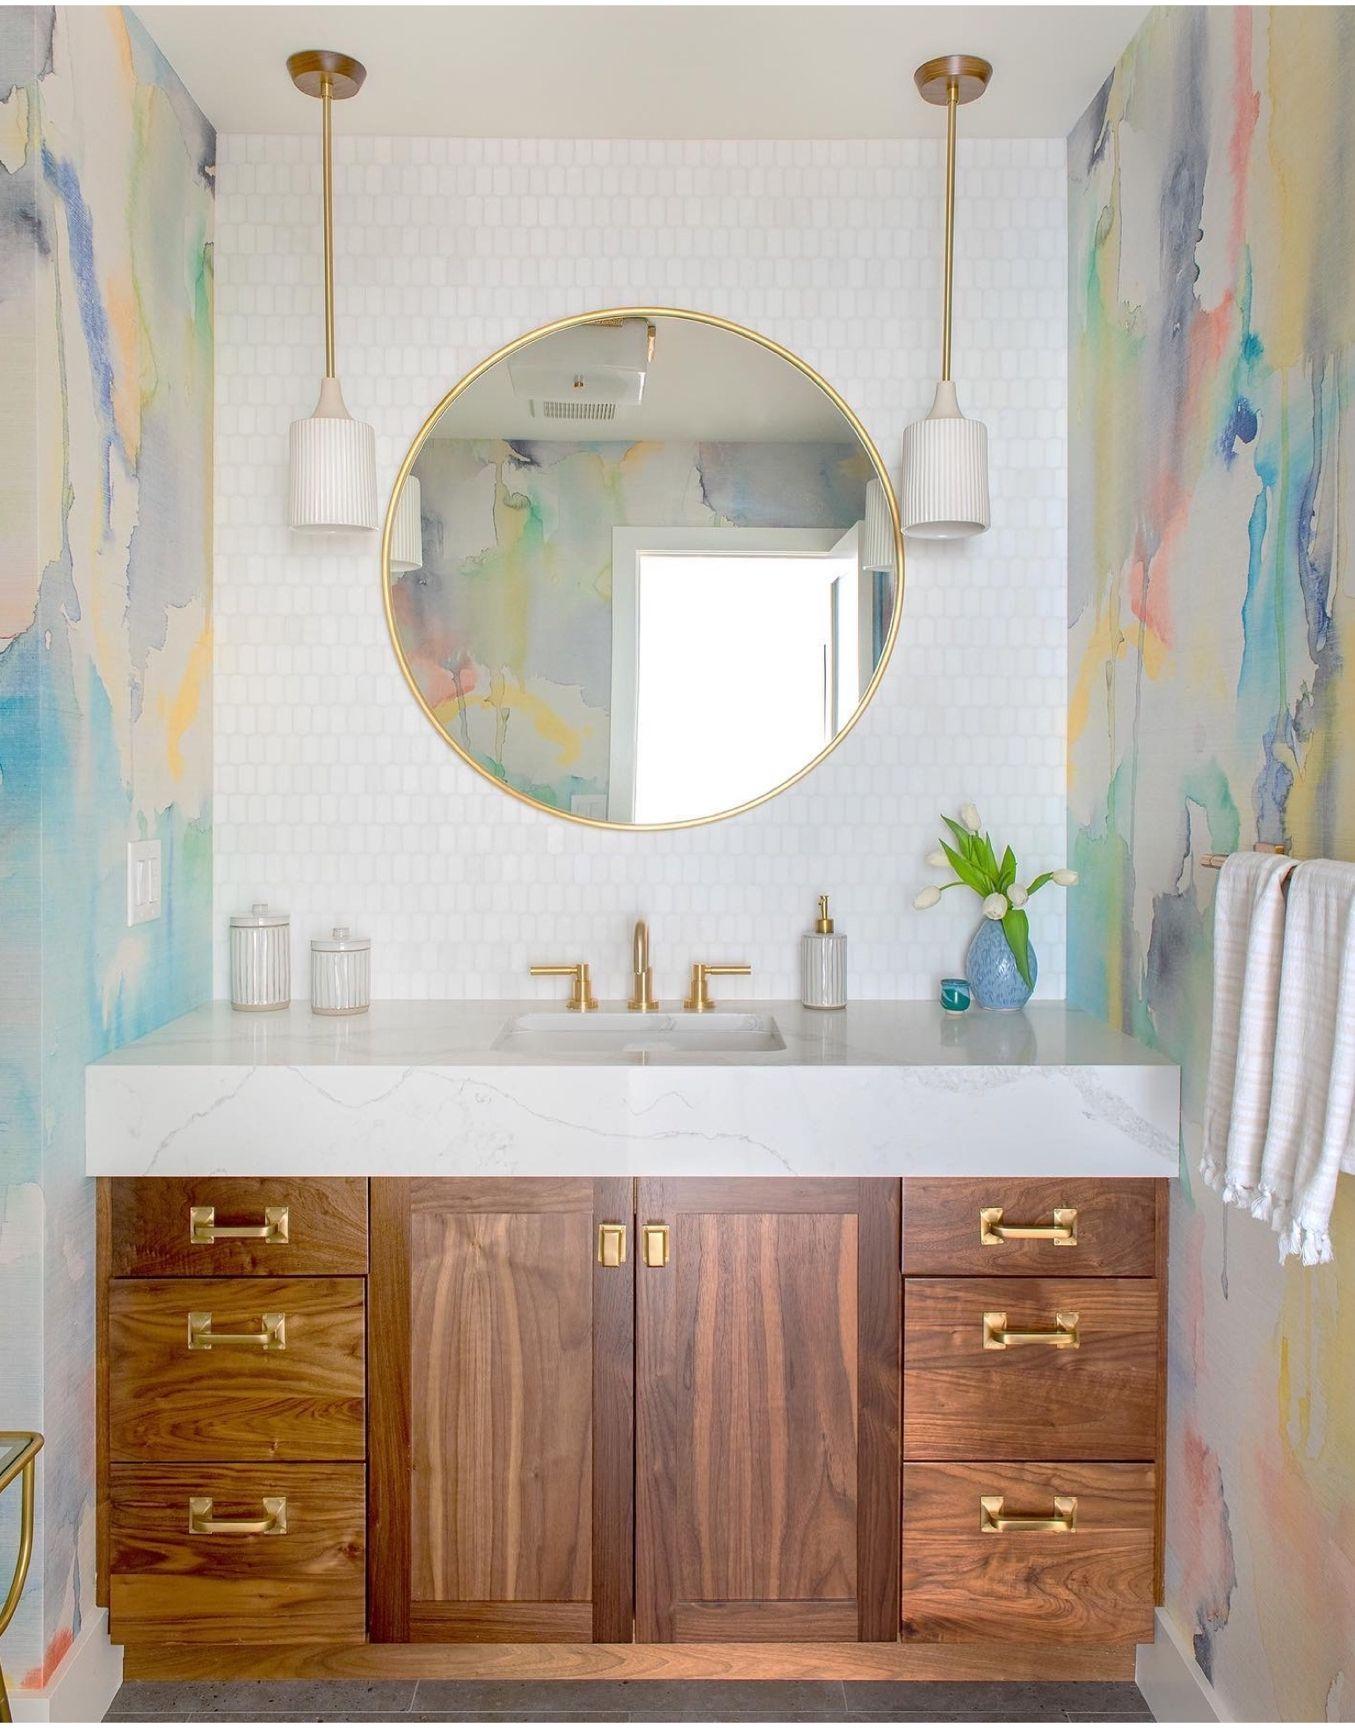 Phillip Jeffries Blur Wallcovering Bathroom Inspiration Round Mirror Bathroom Living Room And Dining Room Design